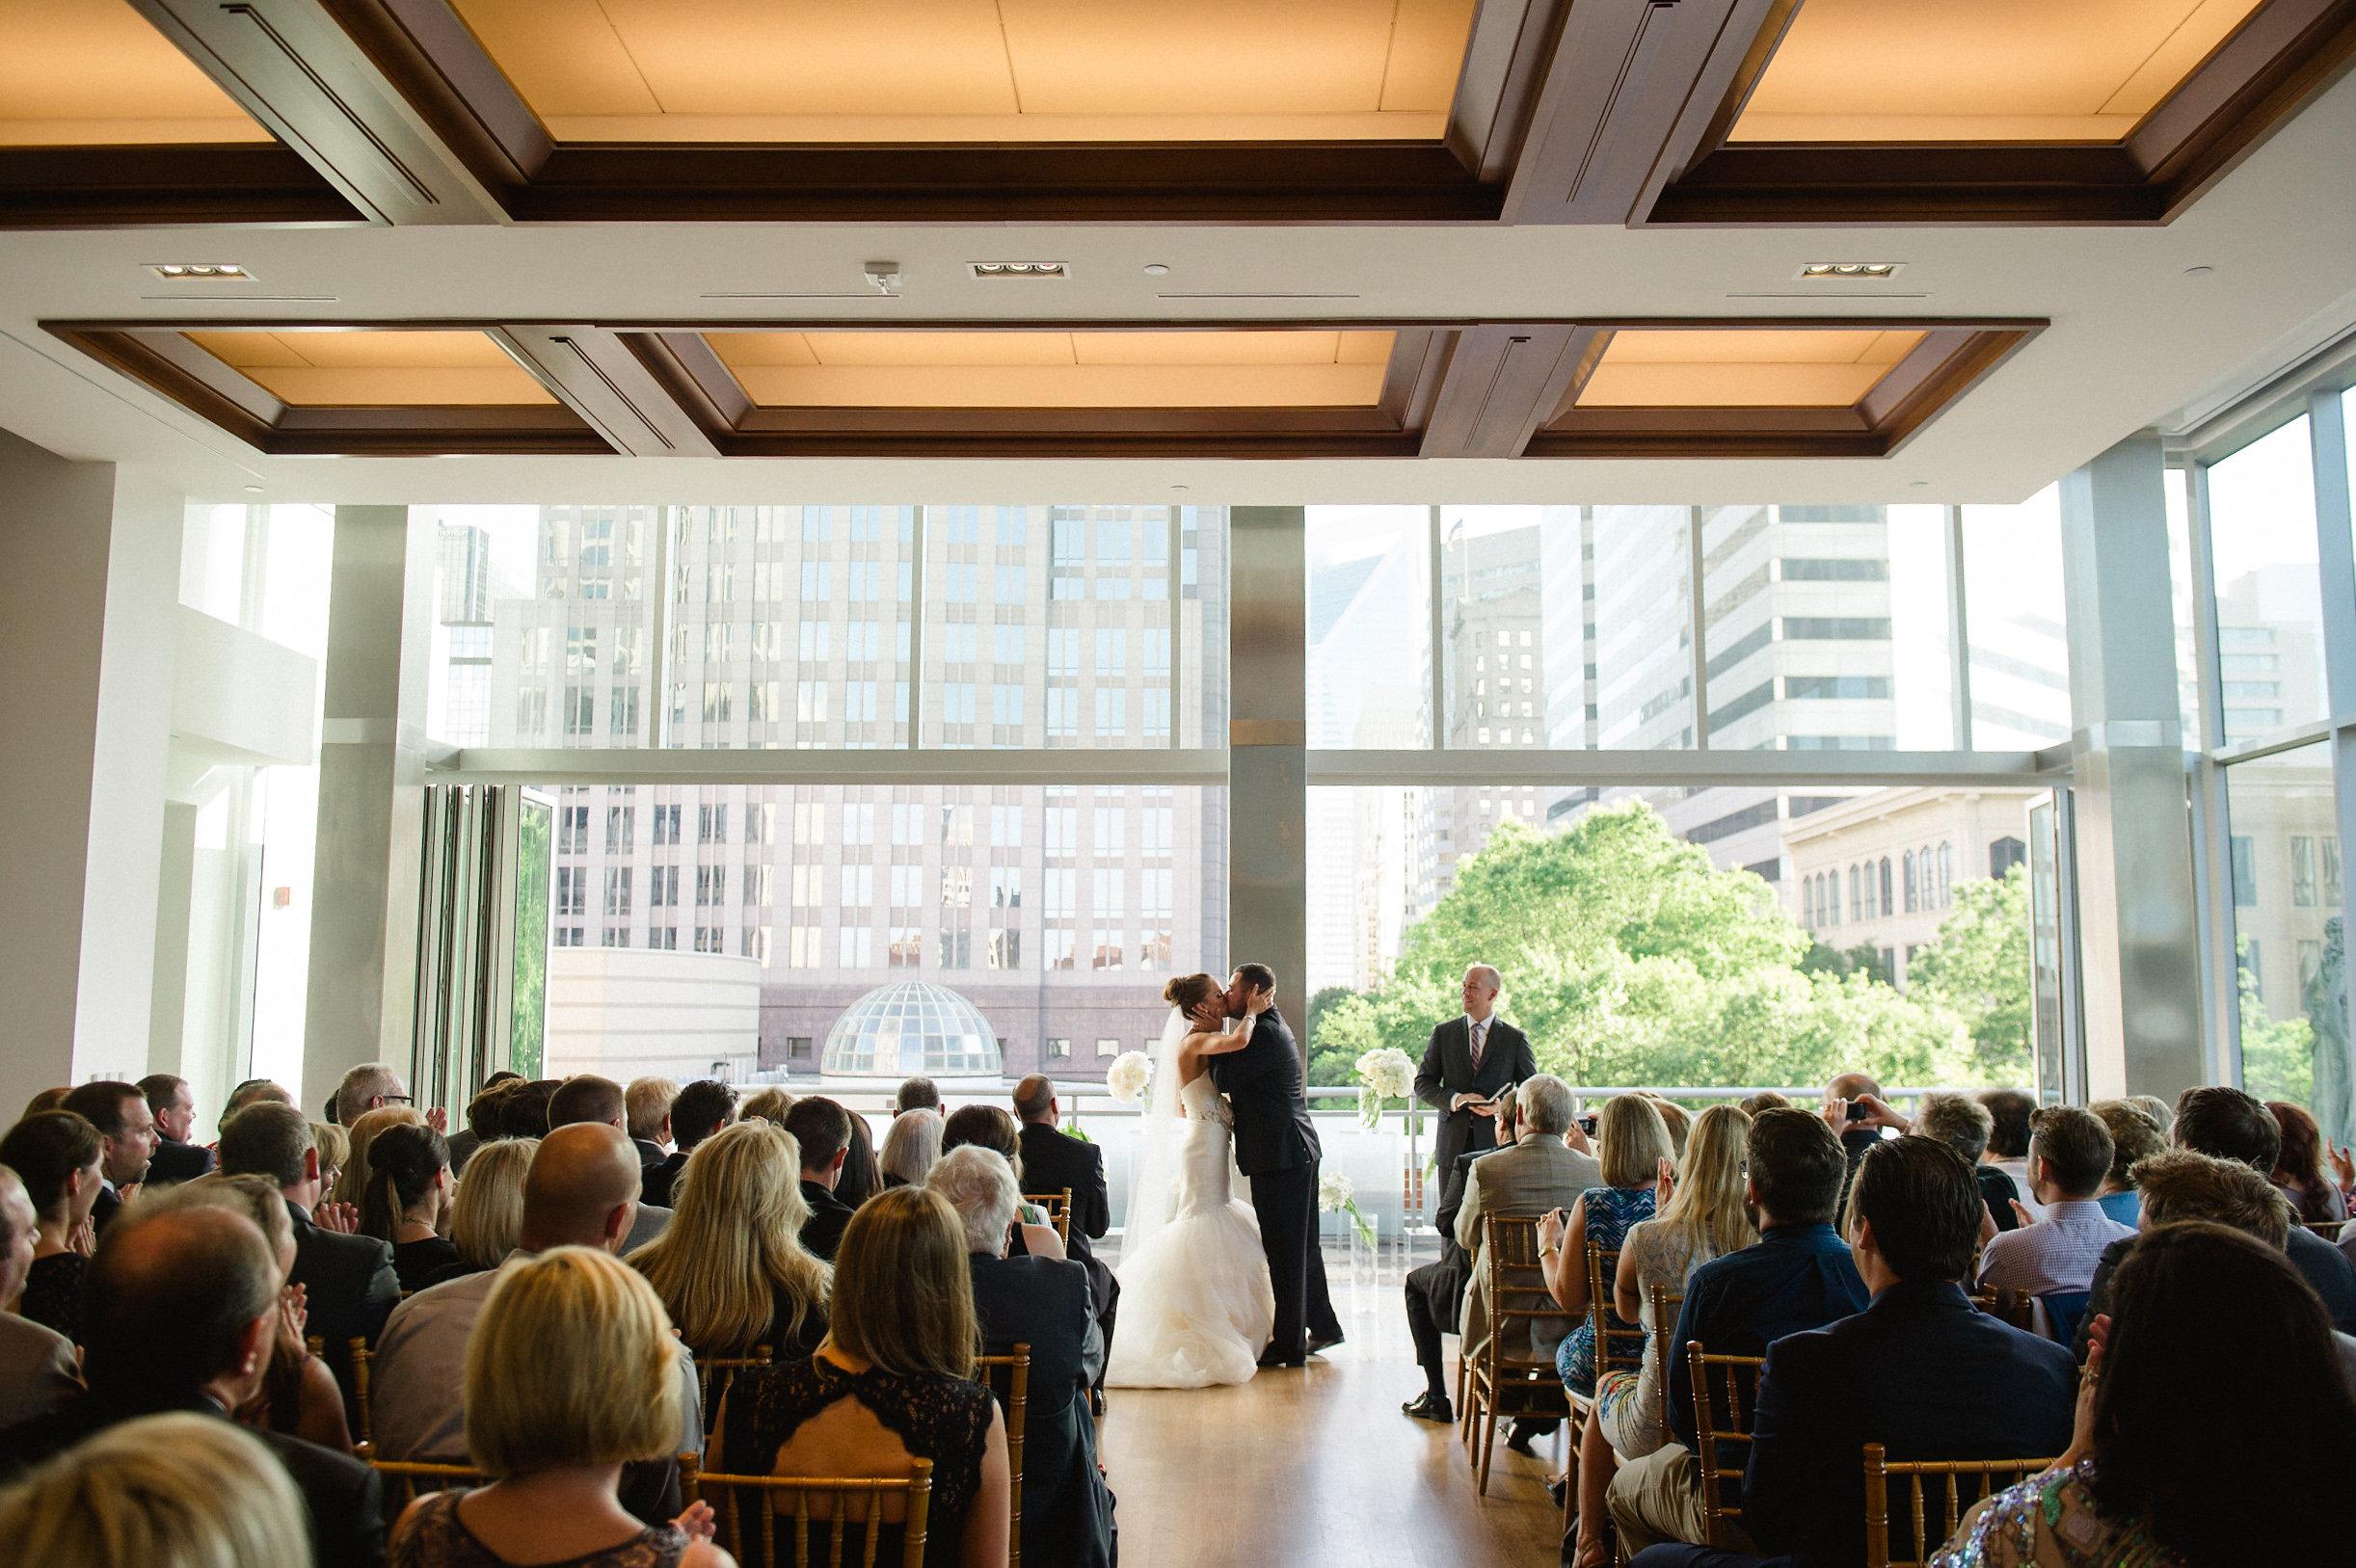 shelby&jordan|smitten&hooked|wedding|ceremony-137.jpg